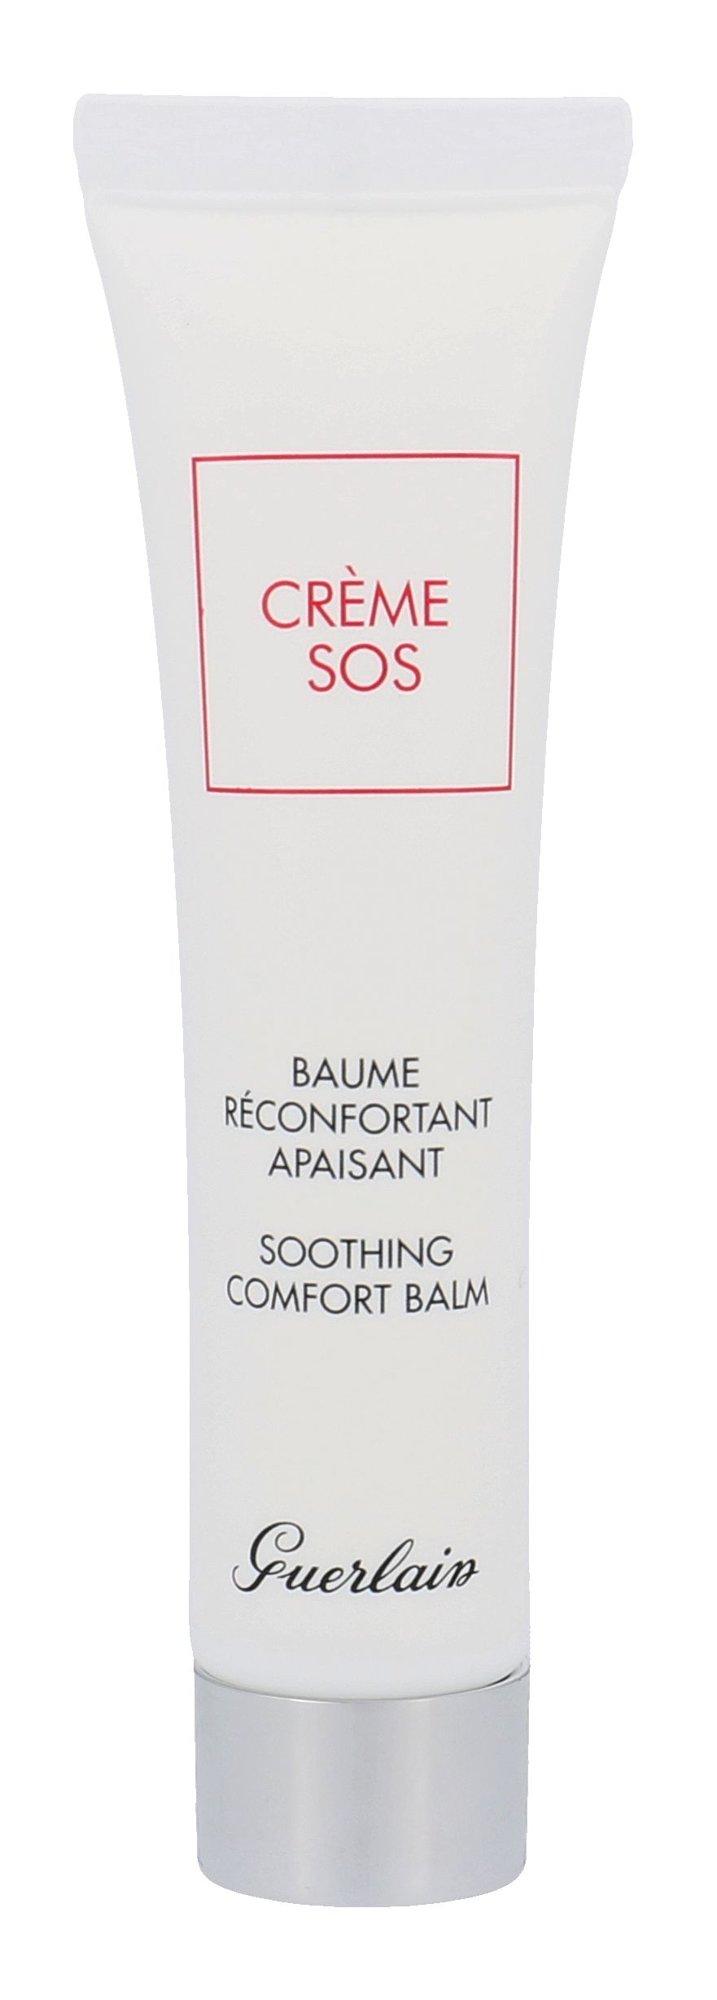 Guerlain My Supertips Cosmetic 15ml  Creme SOS